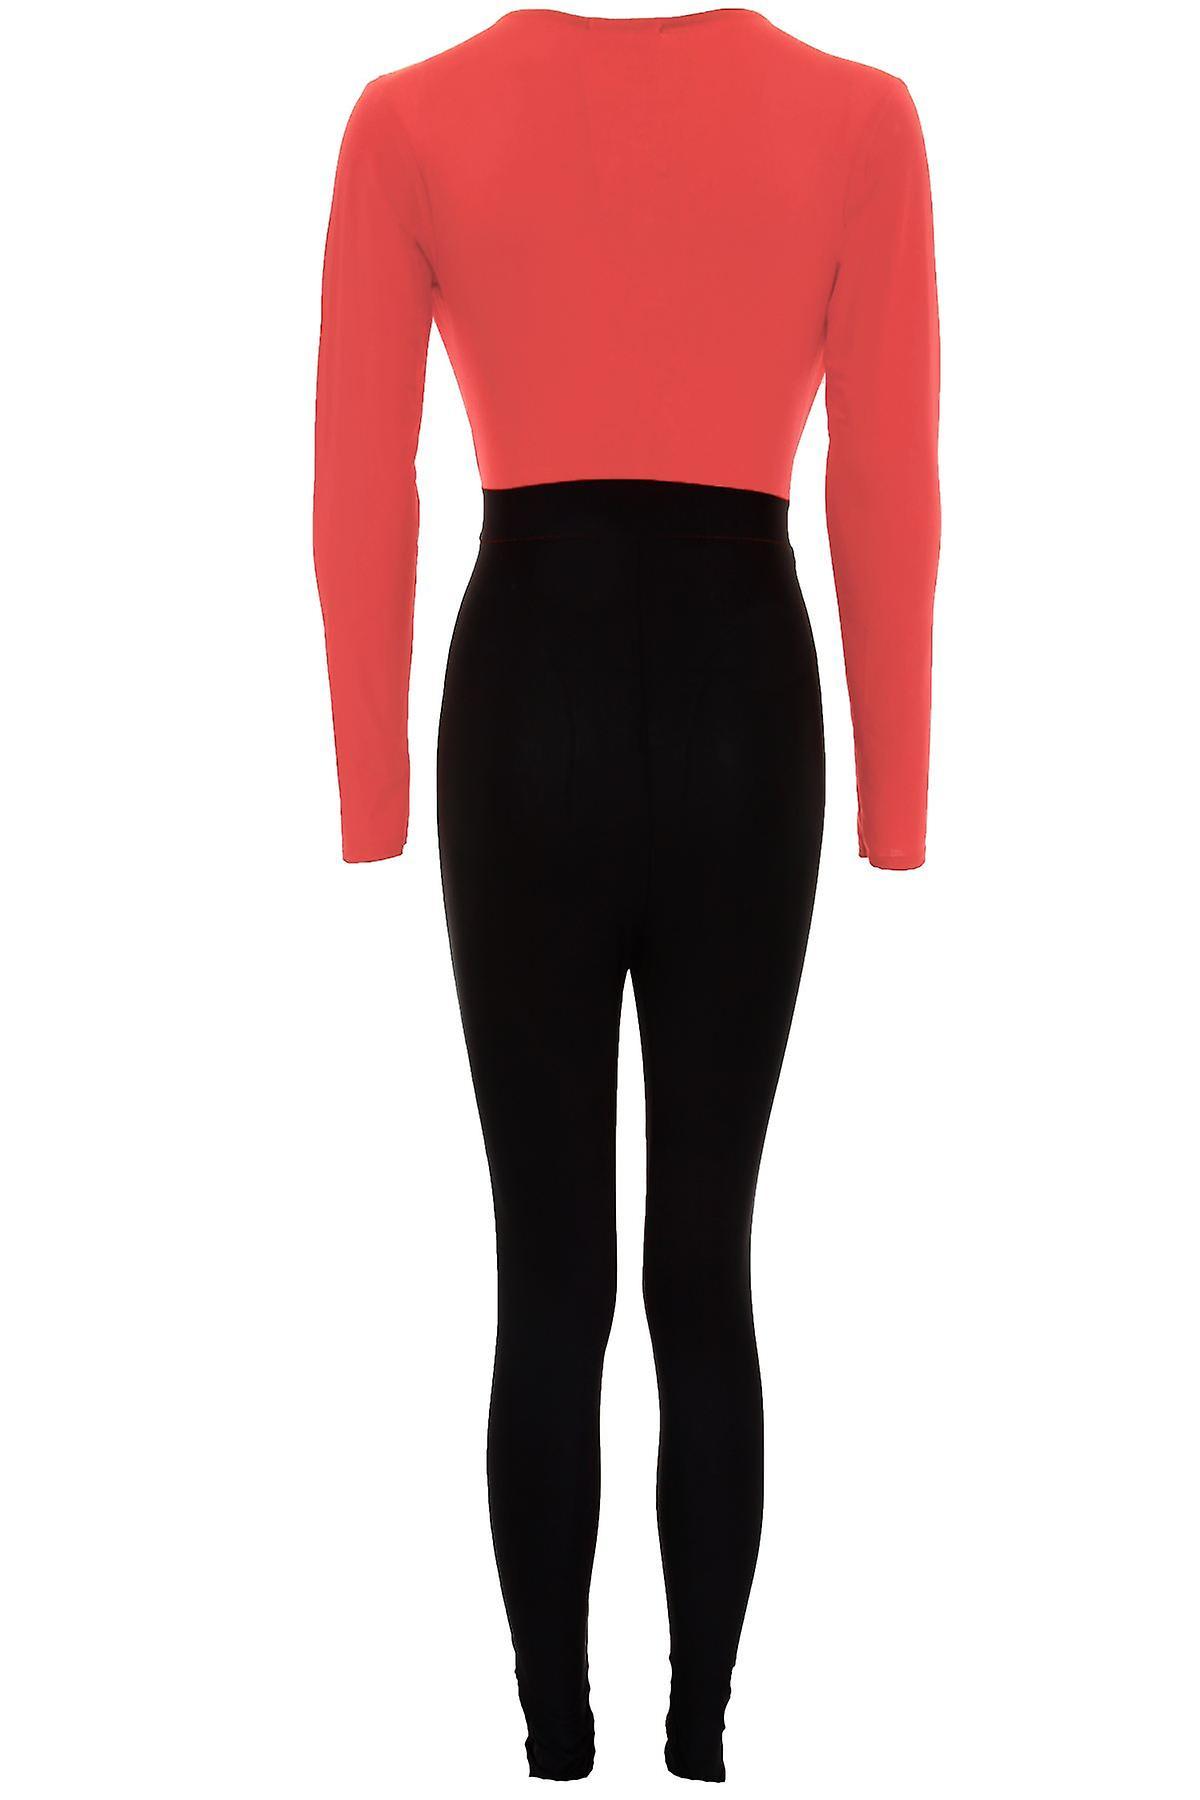 Ladies Long Sleeve Plunge V Neck Buckle Contrast Women's Jumpsuit Trousers